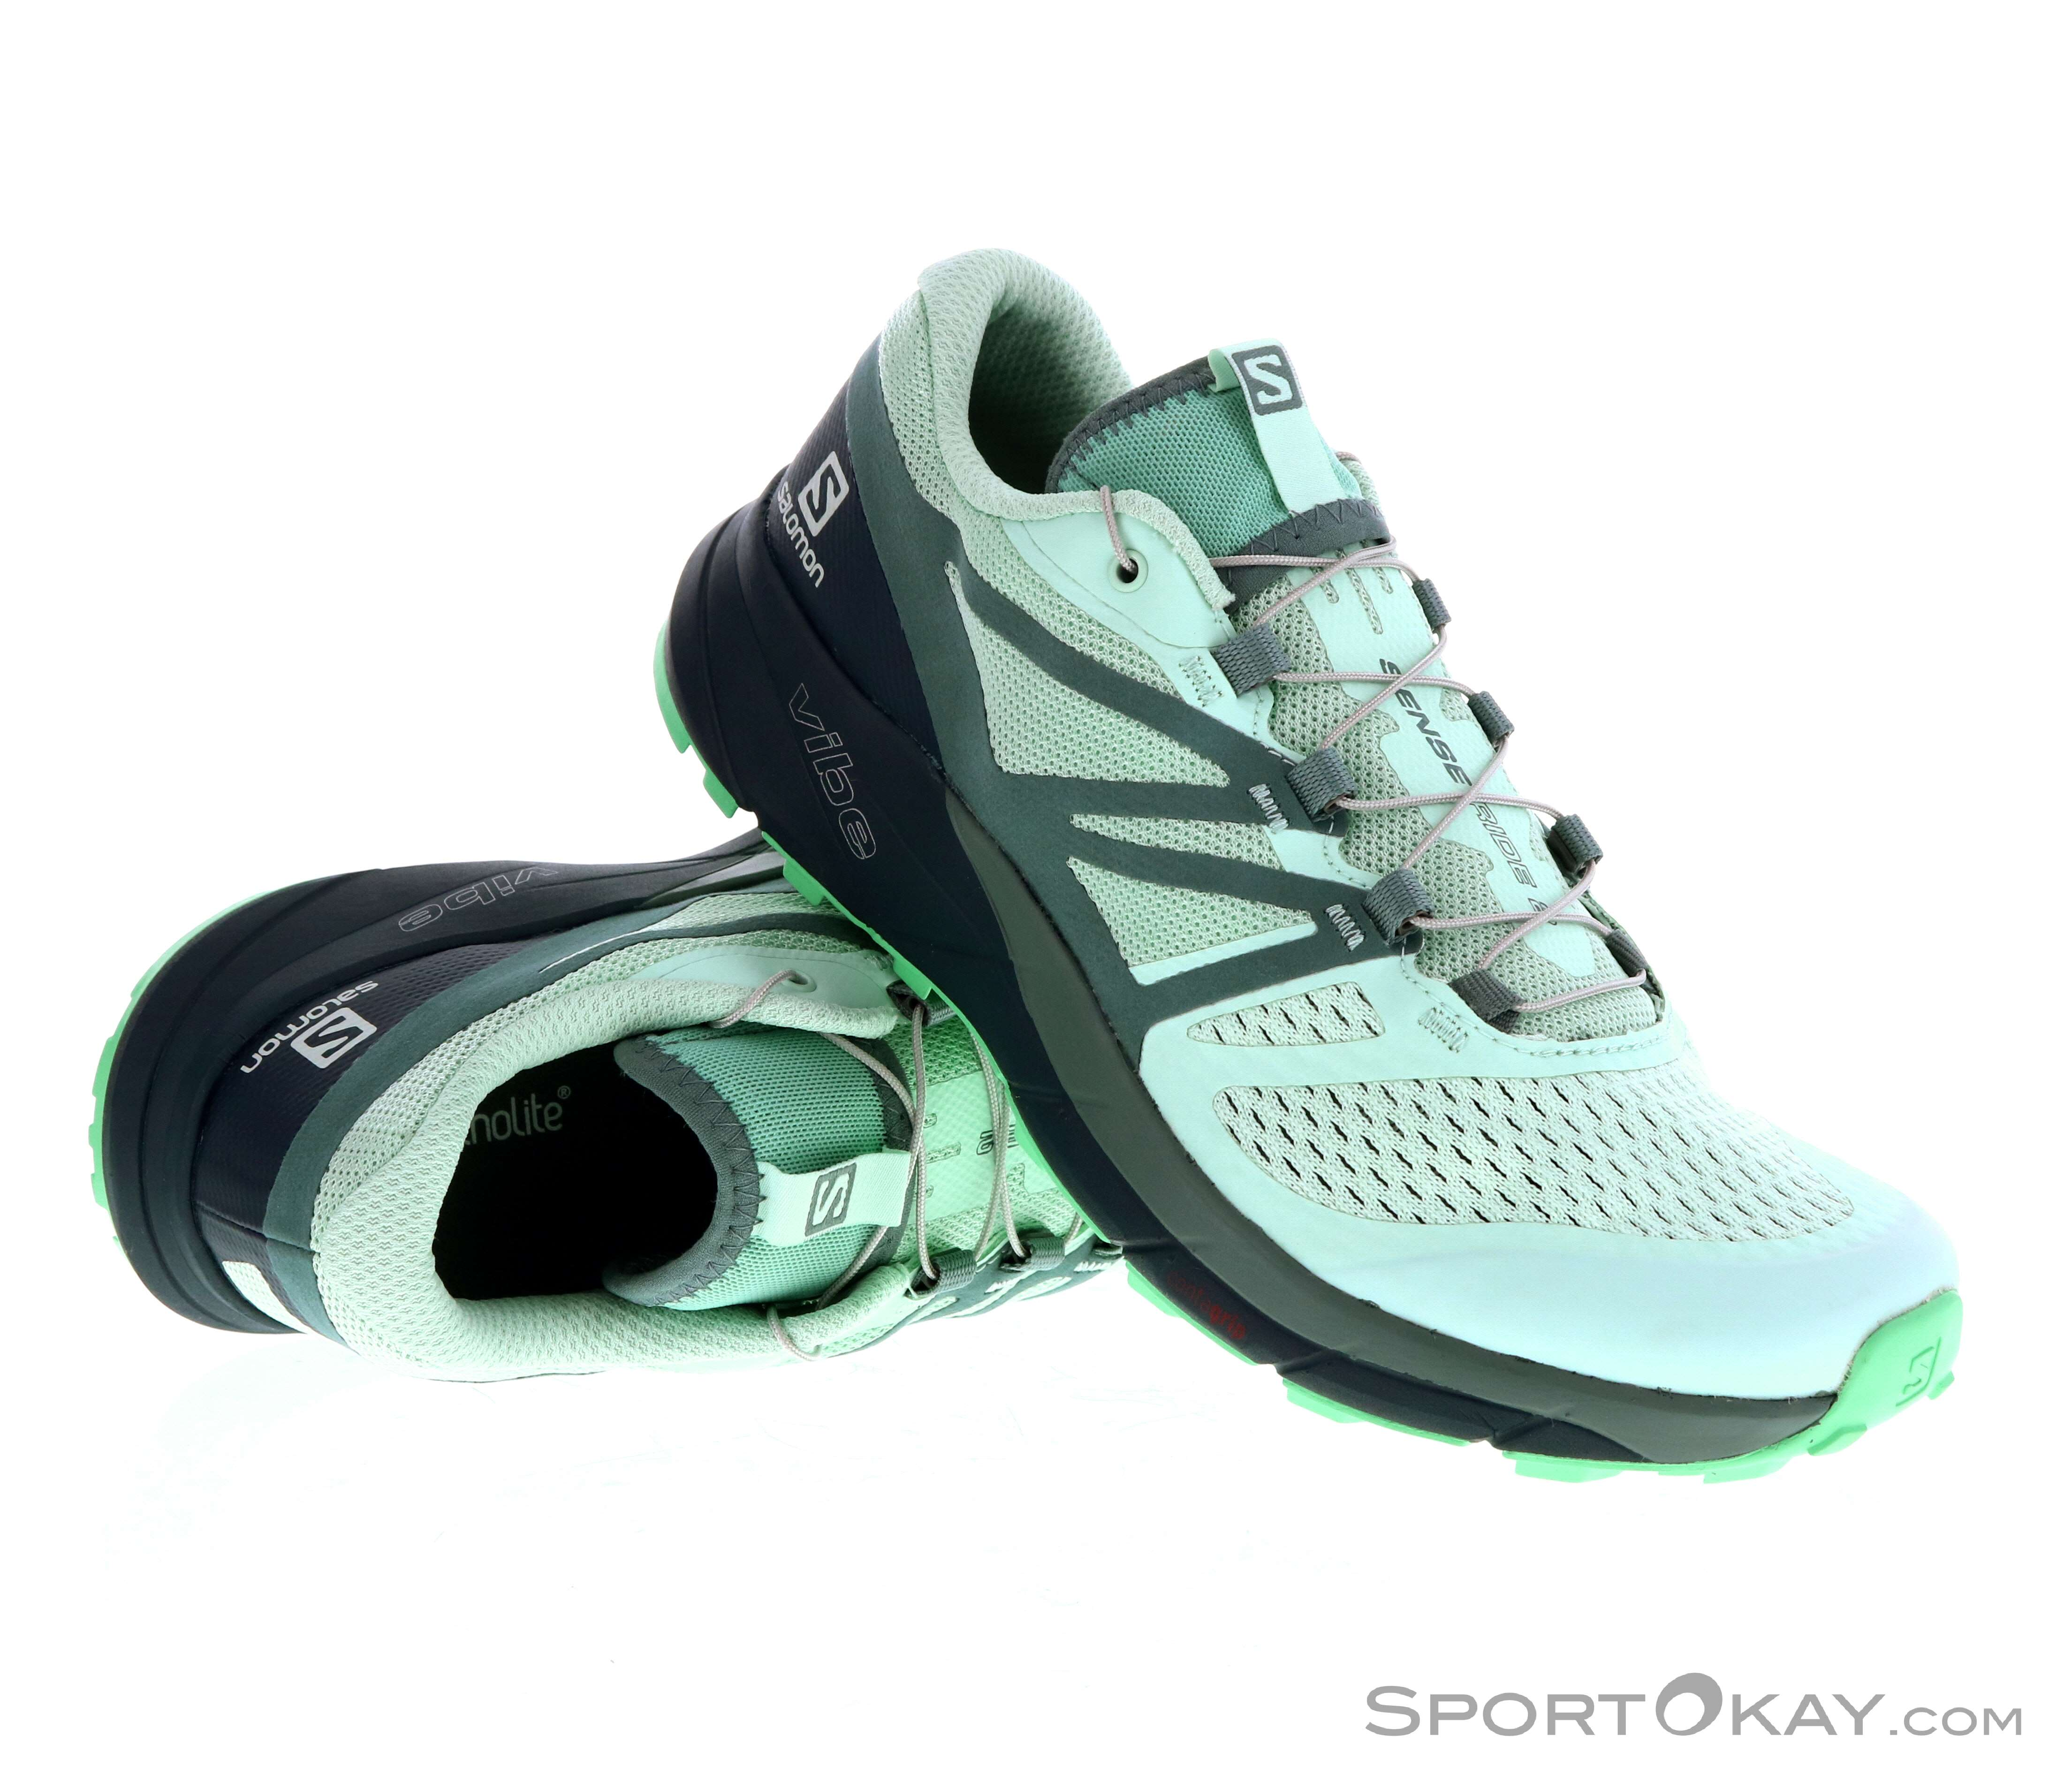 Salomon Salomon Sense Ride 2 Womens Running Shoes